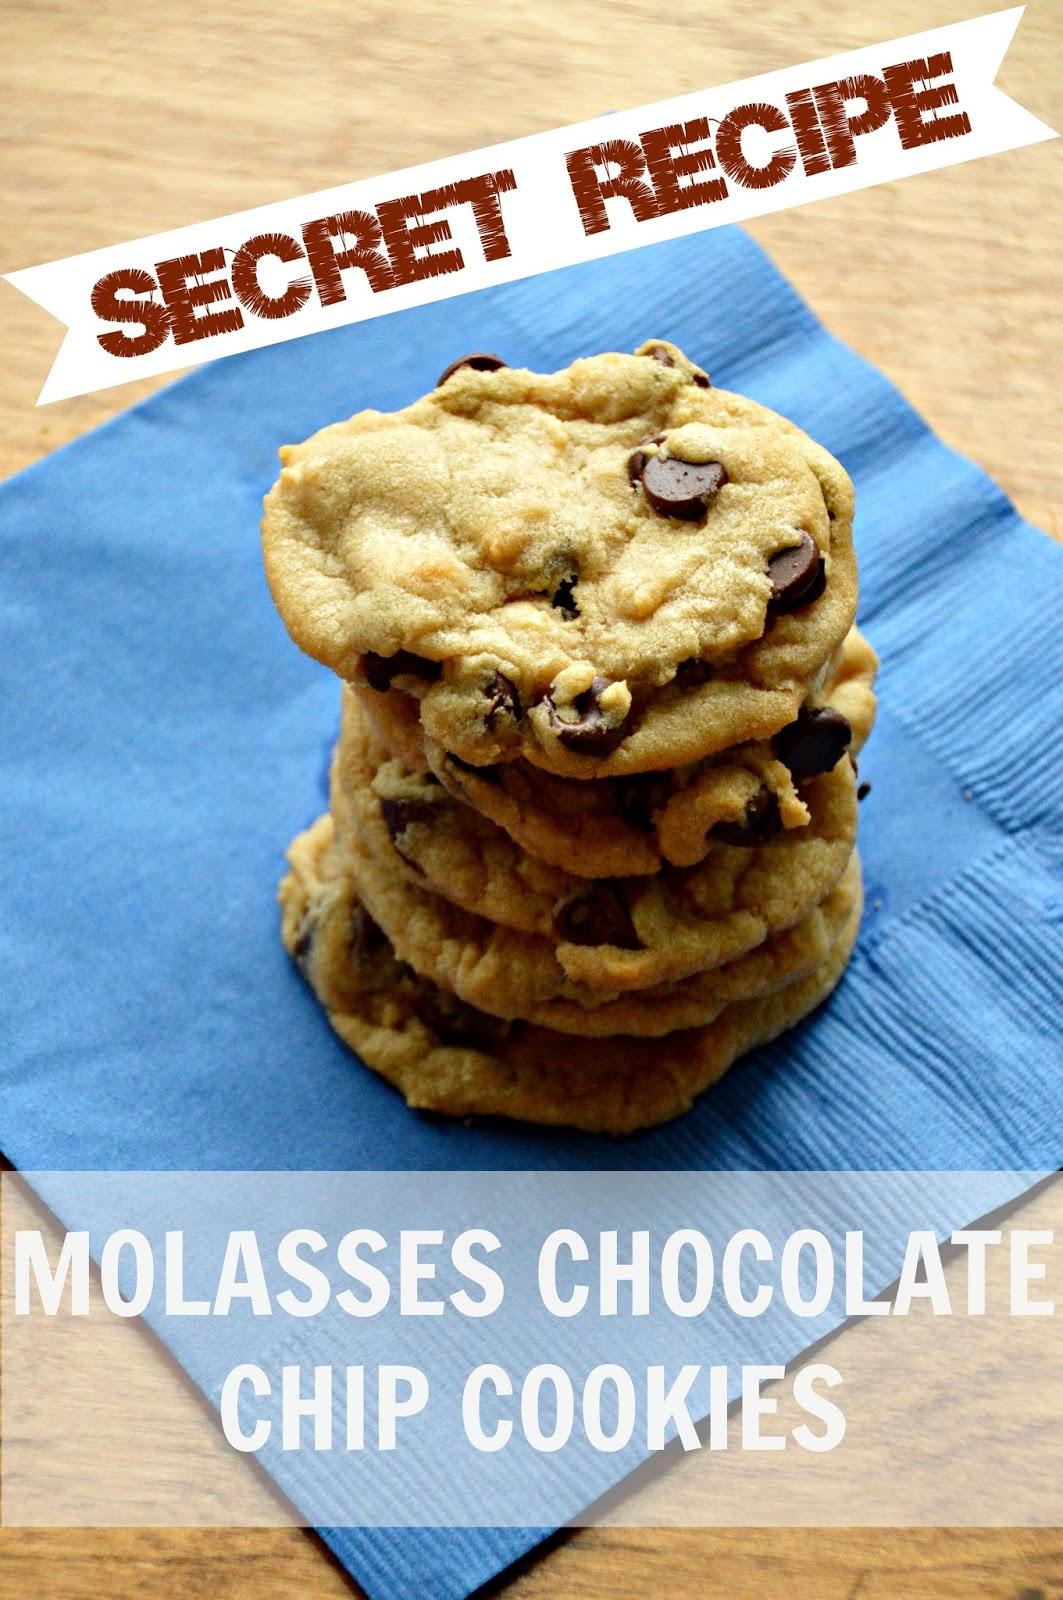 Secret Recipe - Molasses Chocolate Chip Cookies! - Tatertots and Jello